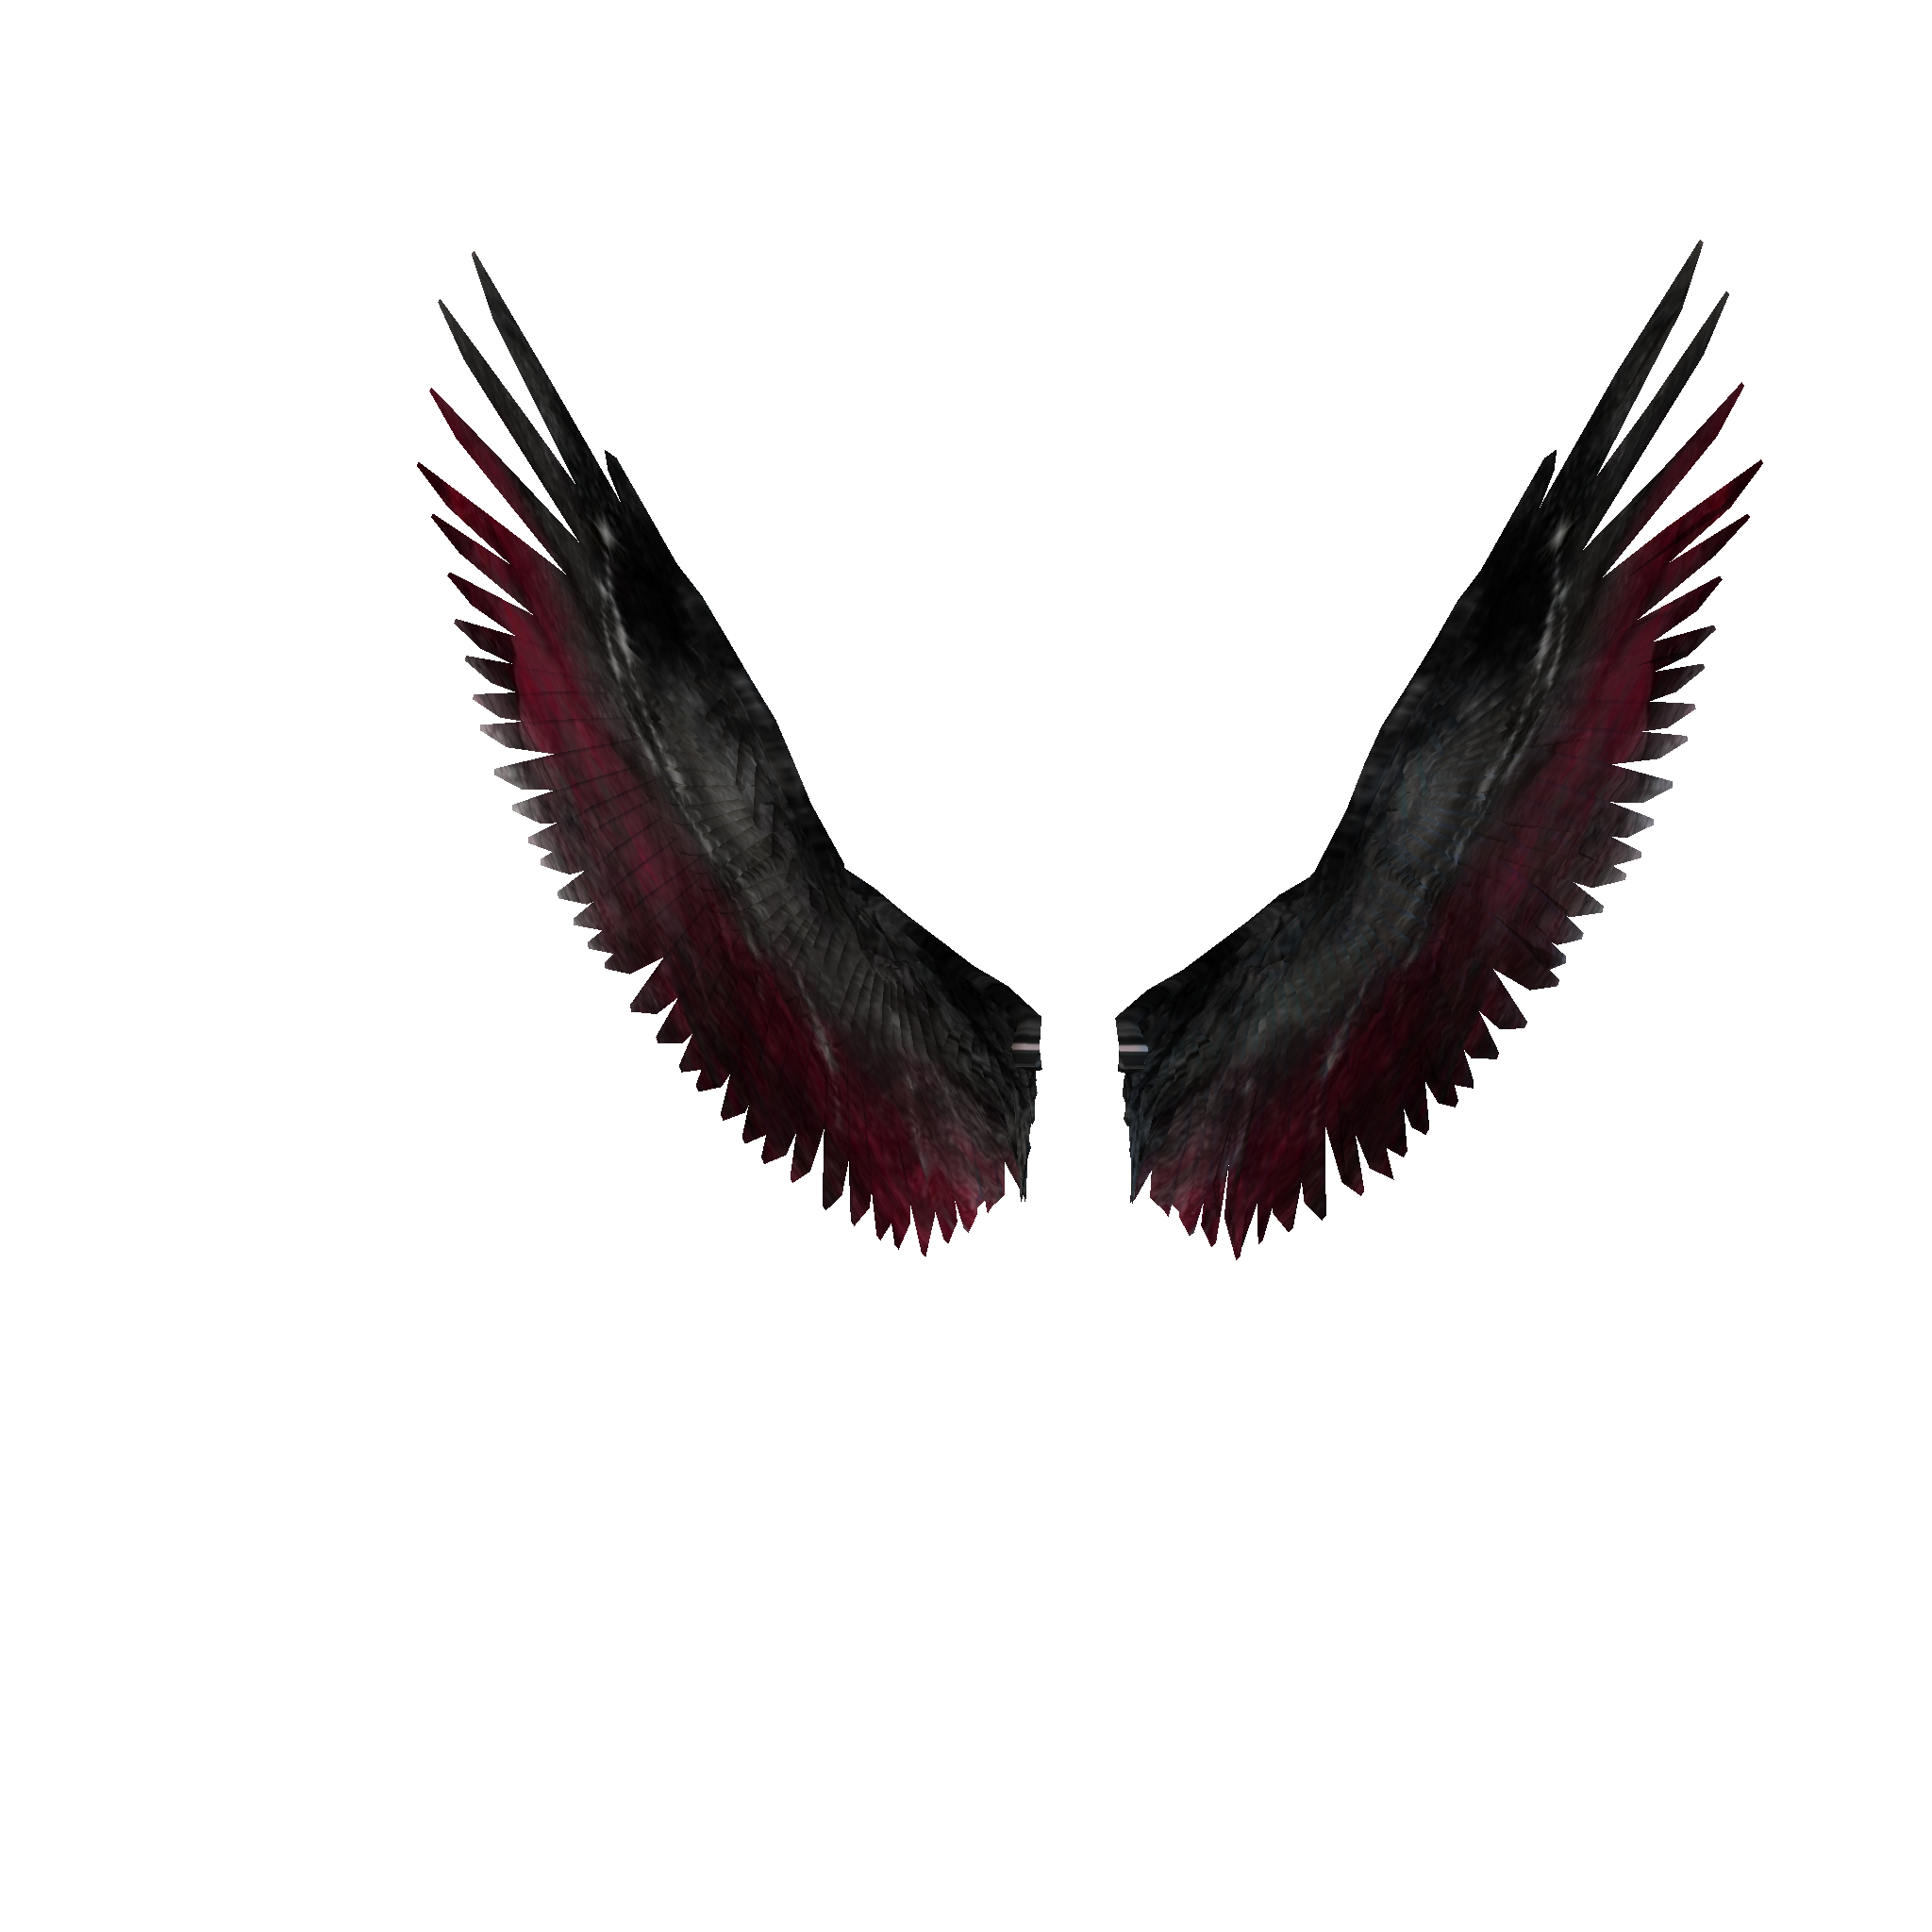 Free Fallen Angel Cliparts, Download Free Clip Art, Free.